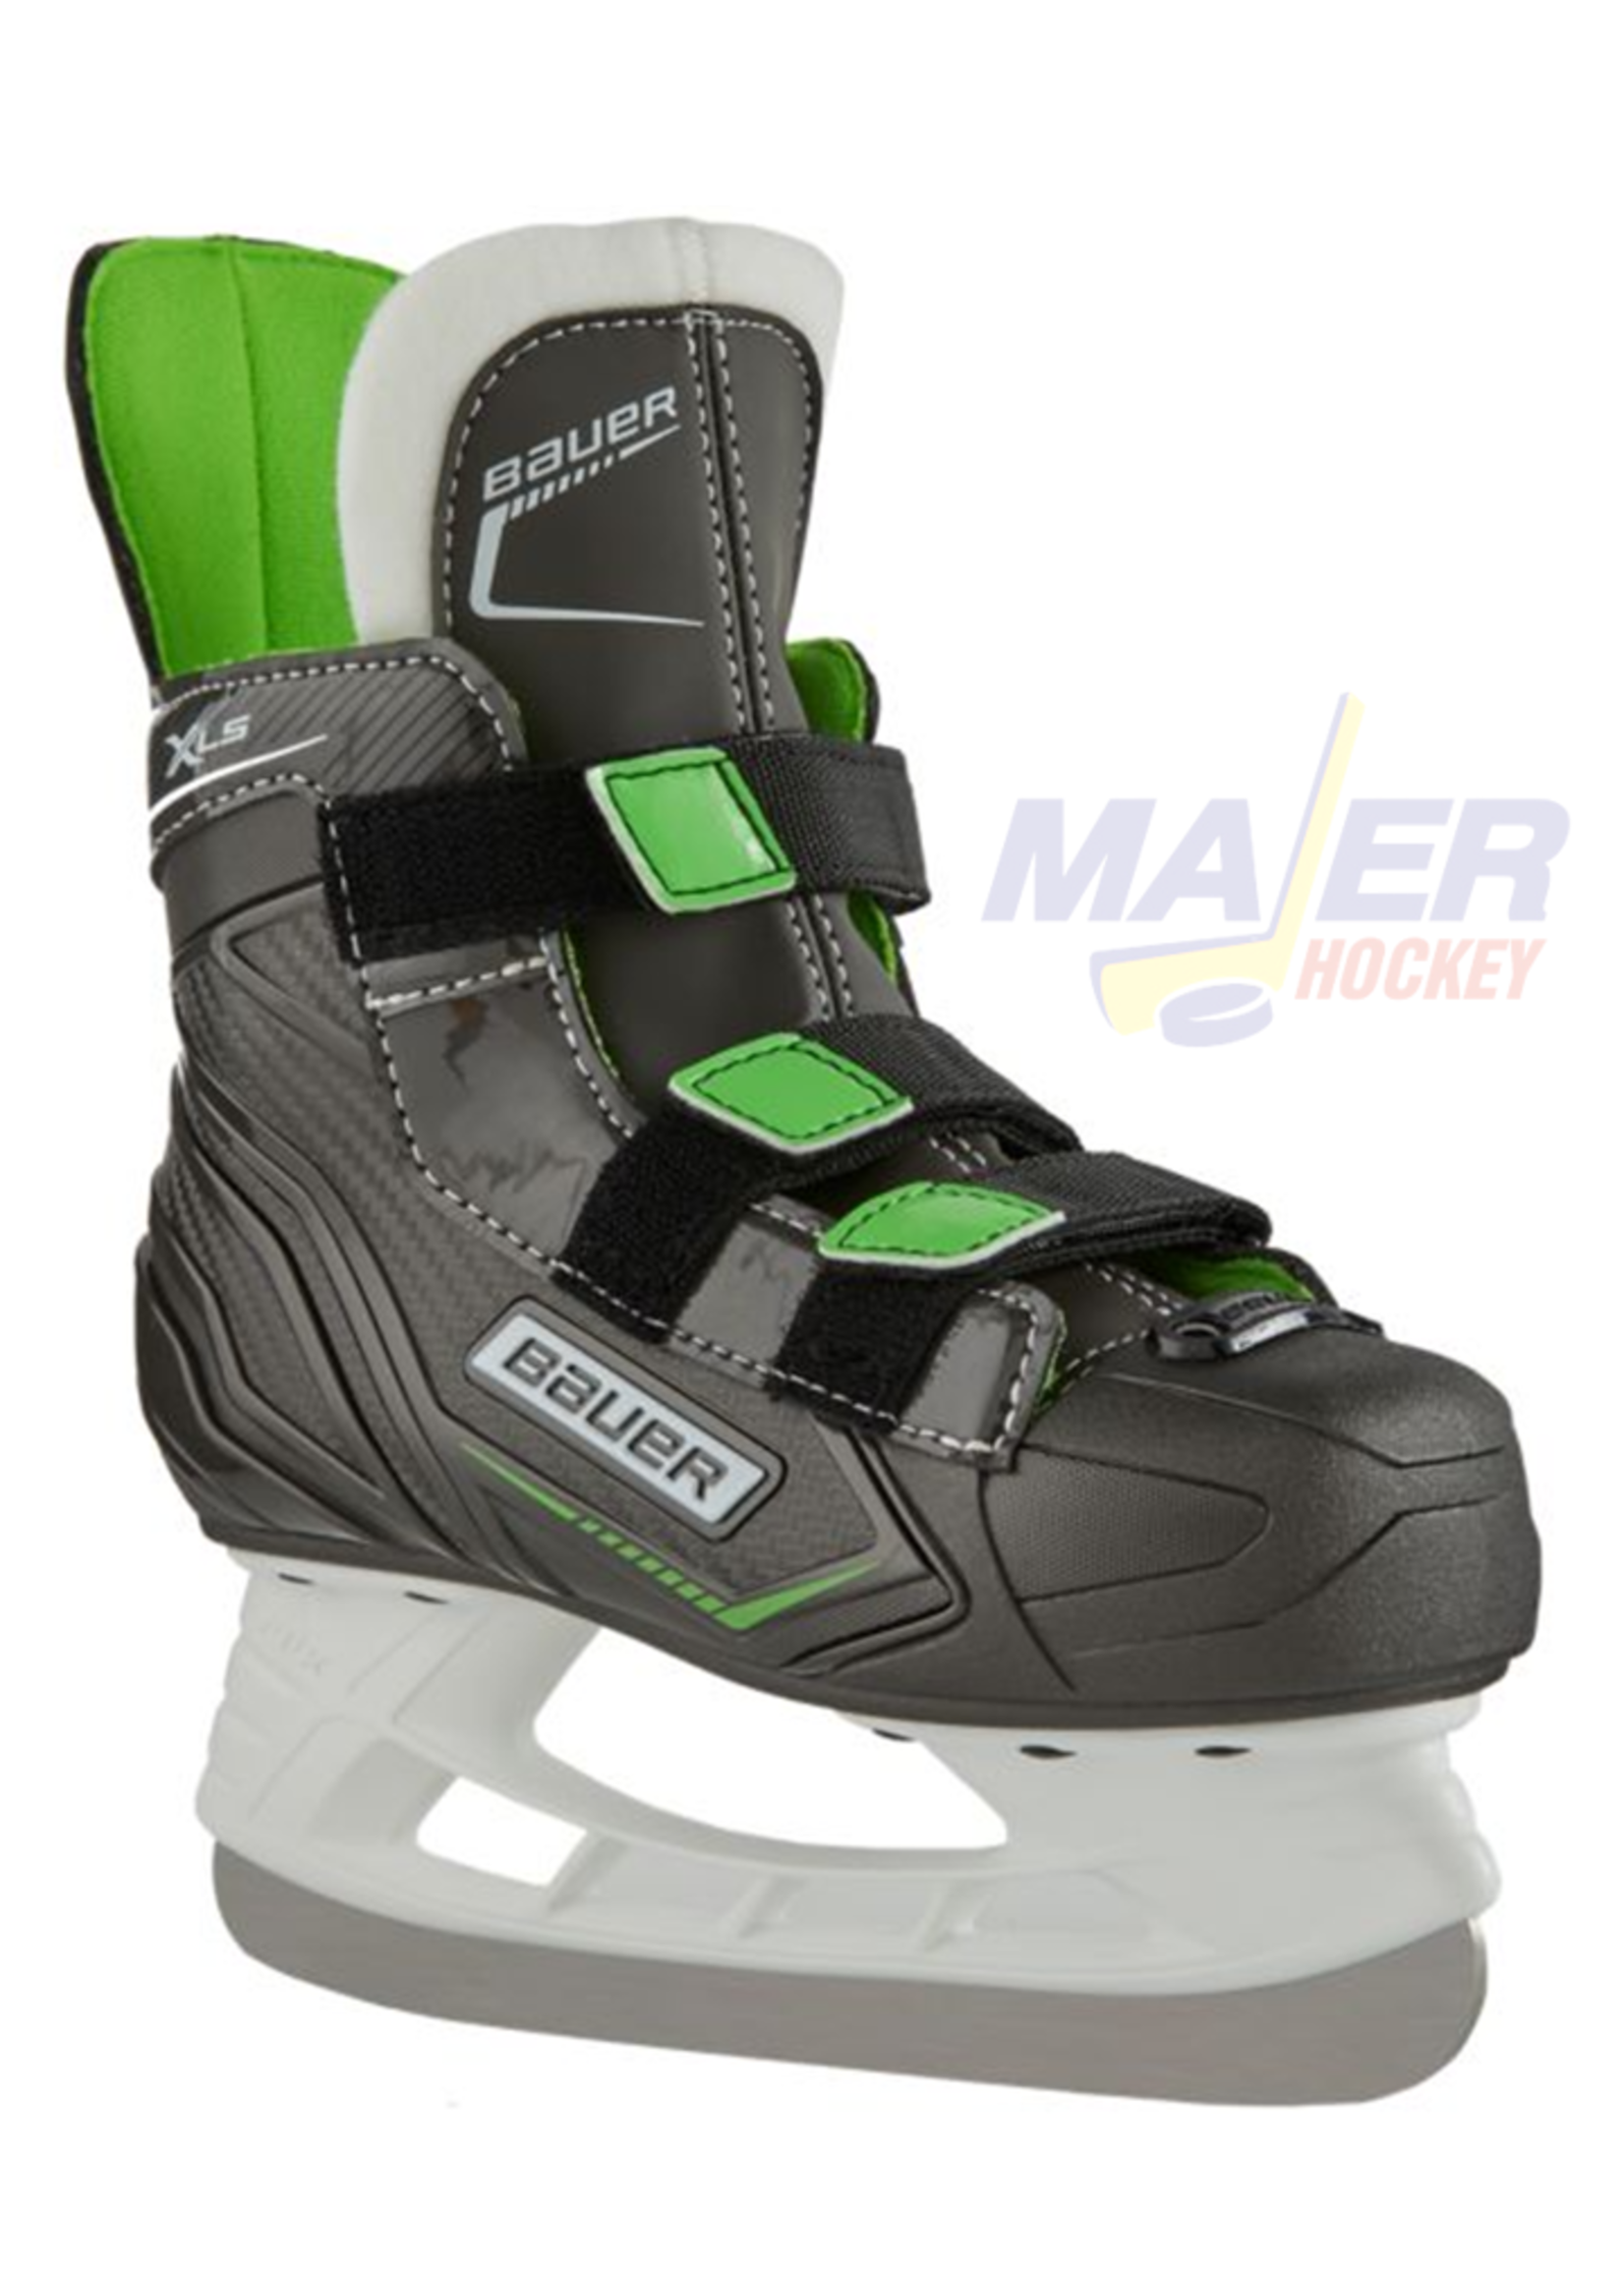 Bauer X-LS Yth Skates